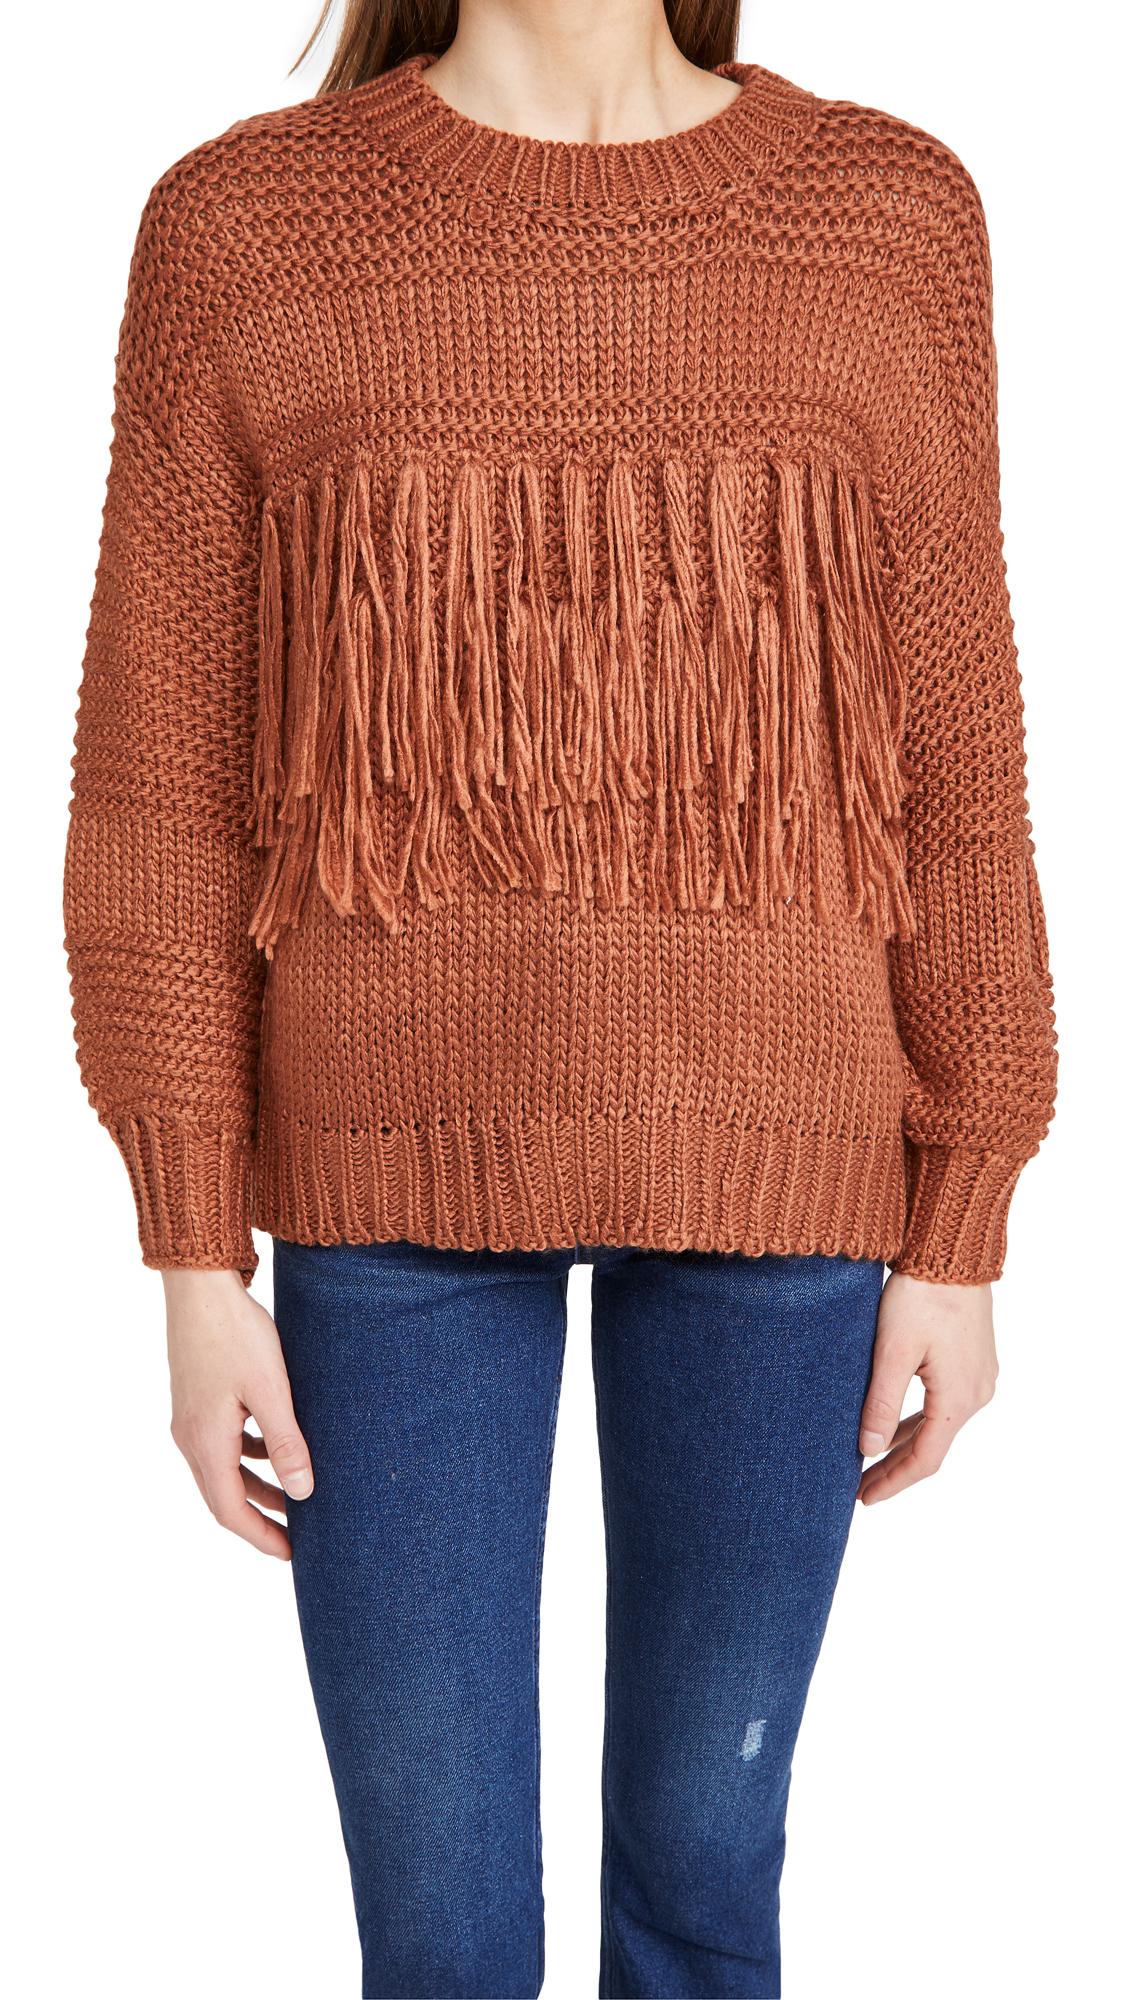 MINKPINK Yoanna Chunky Fringe Knit Sweater